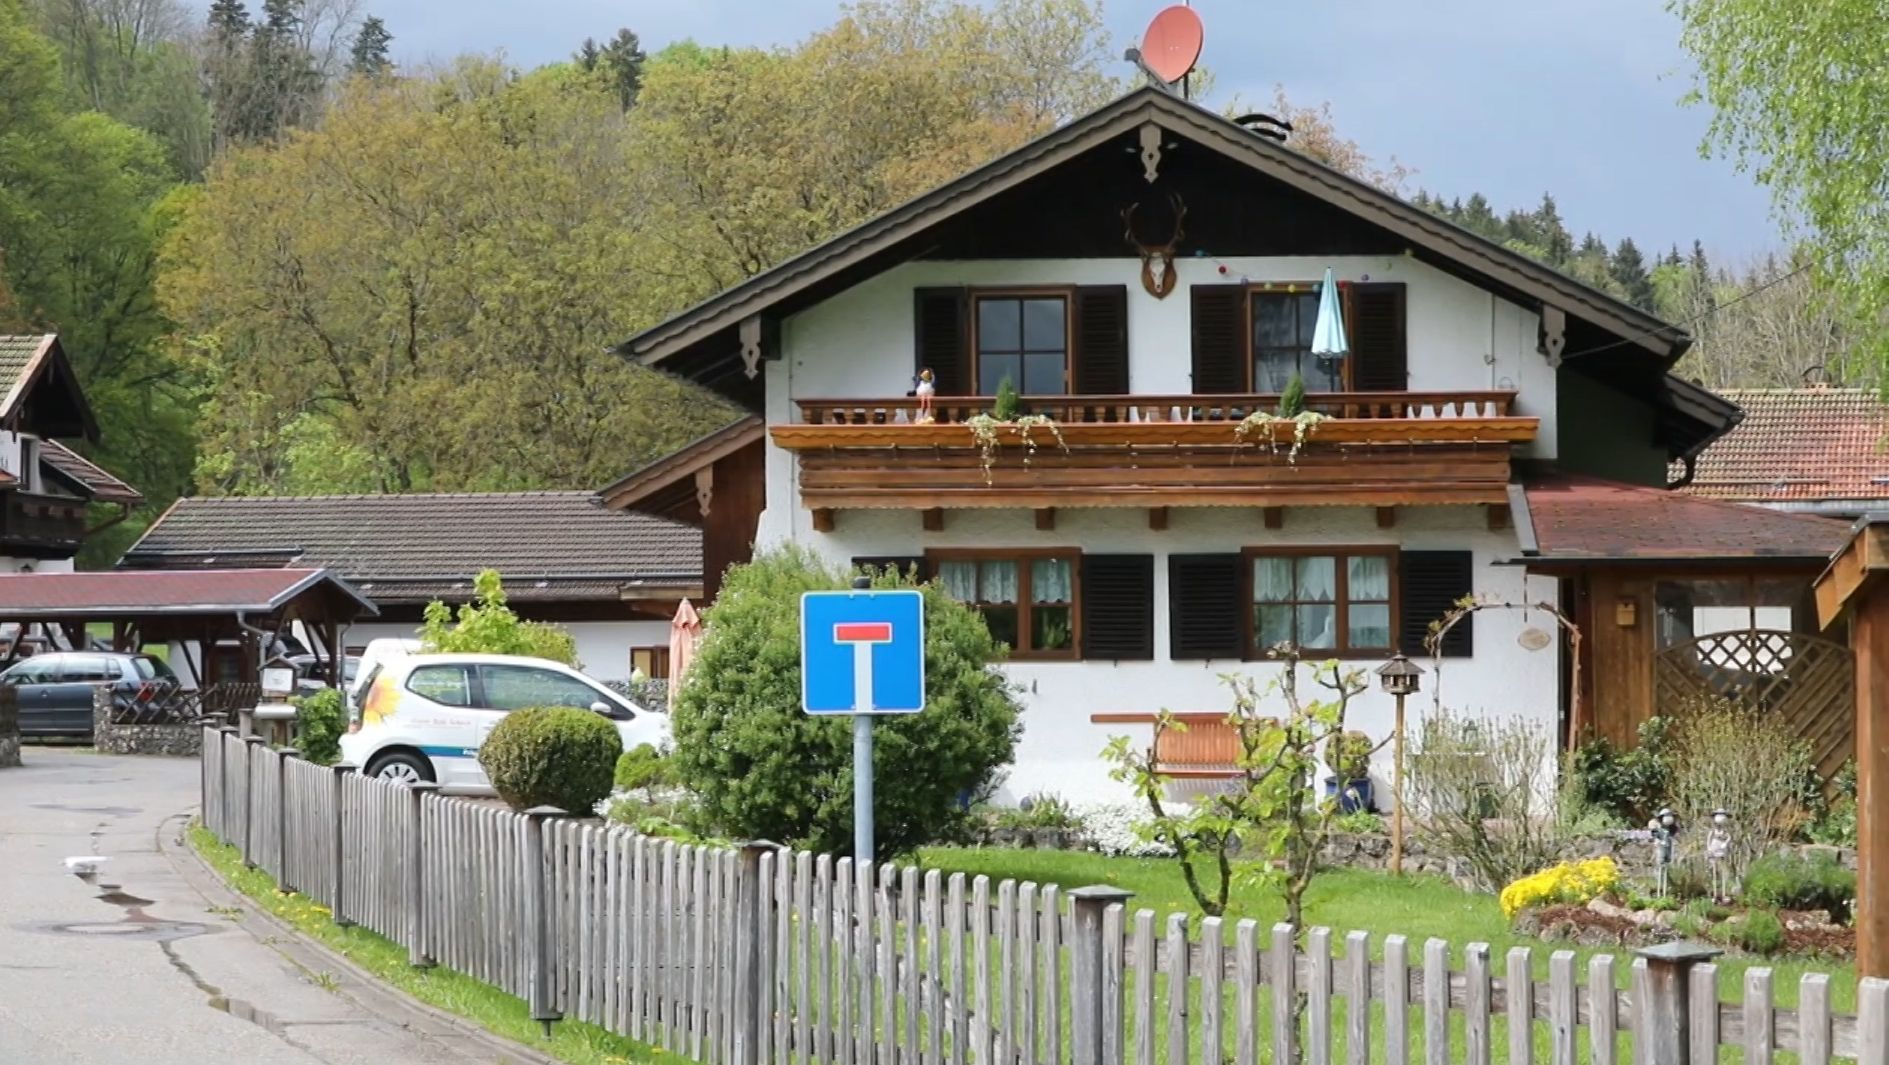 In Bernau zwei Menschen an Kohlenmonoxid-Vergiftung gestorben